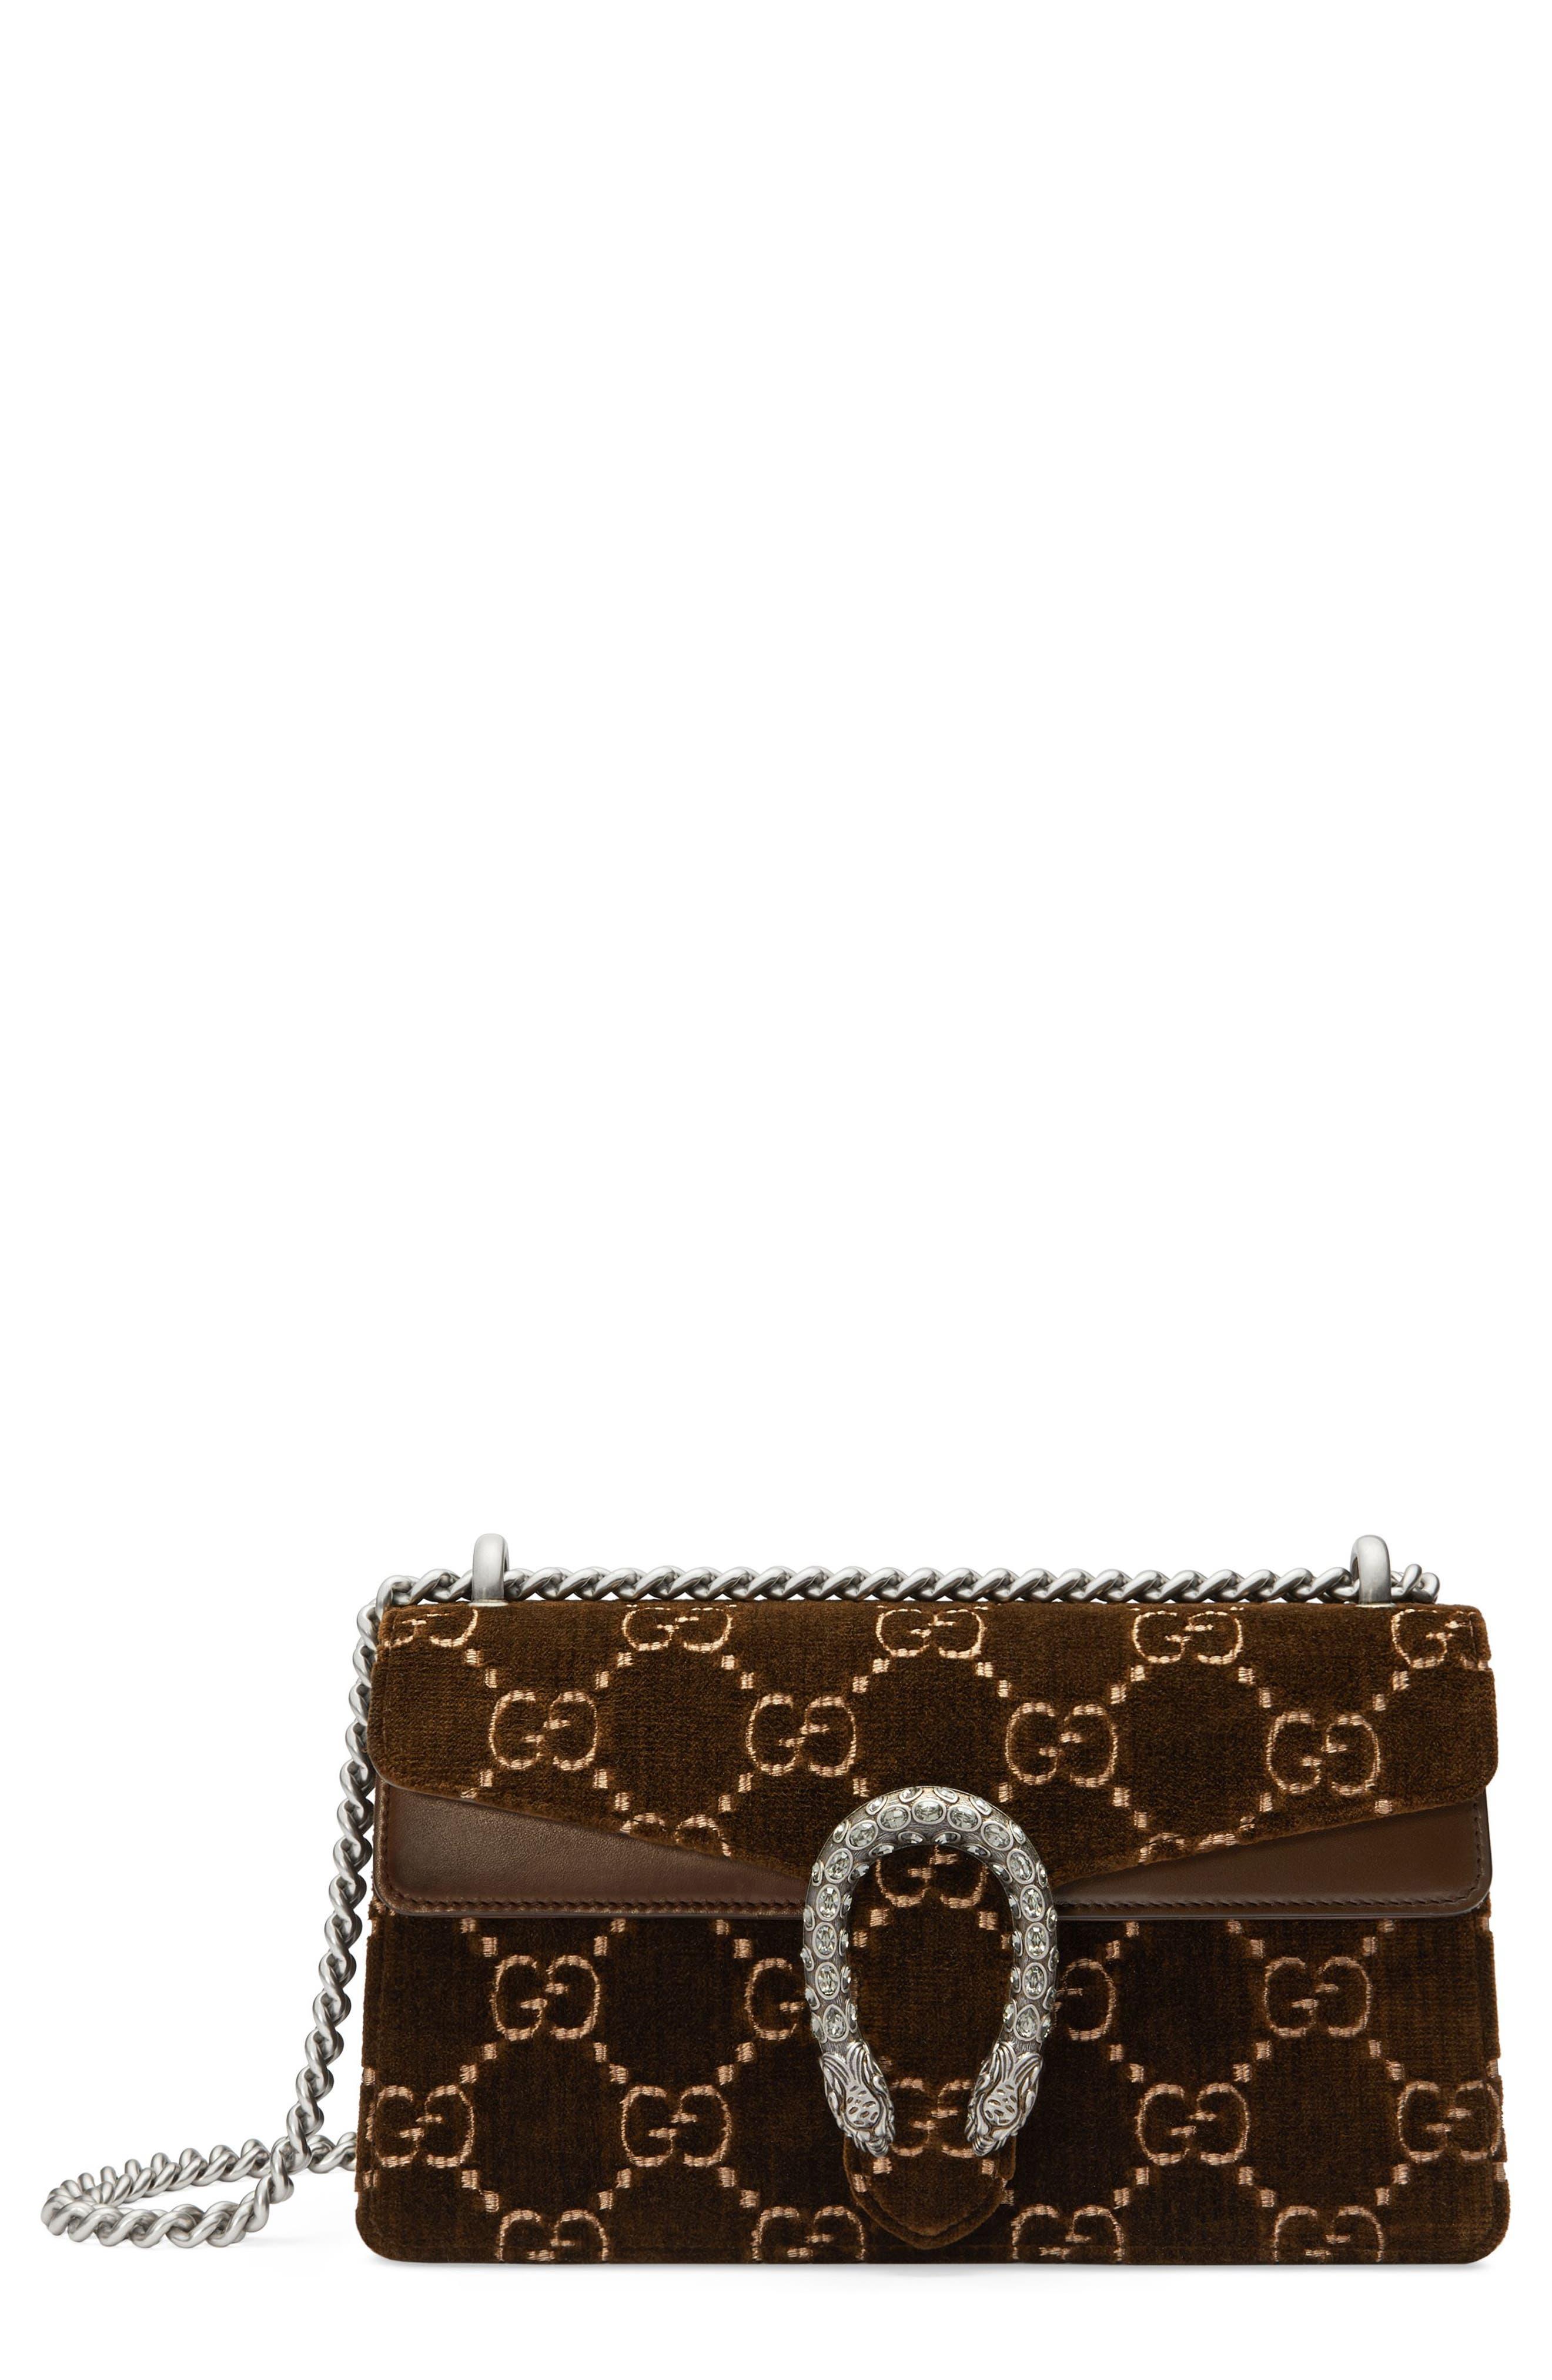 Small Dionysus GG Velvet Shoulder Bag,                             Main thumbnail 1, color,                             BROWN